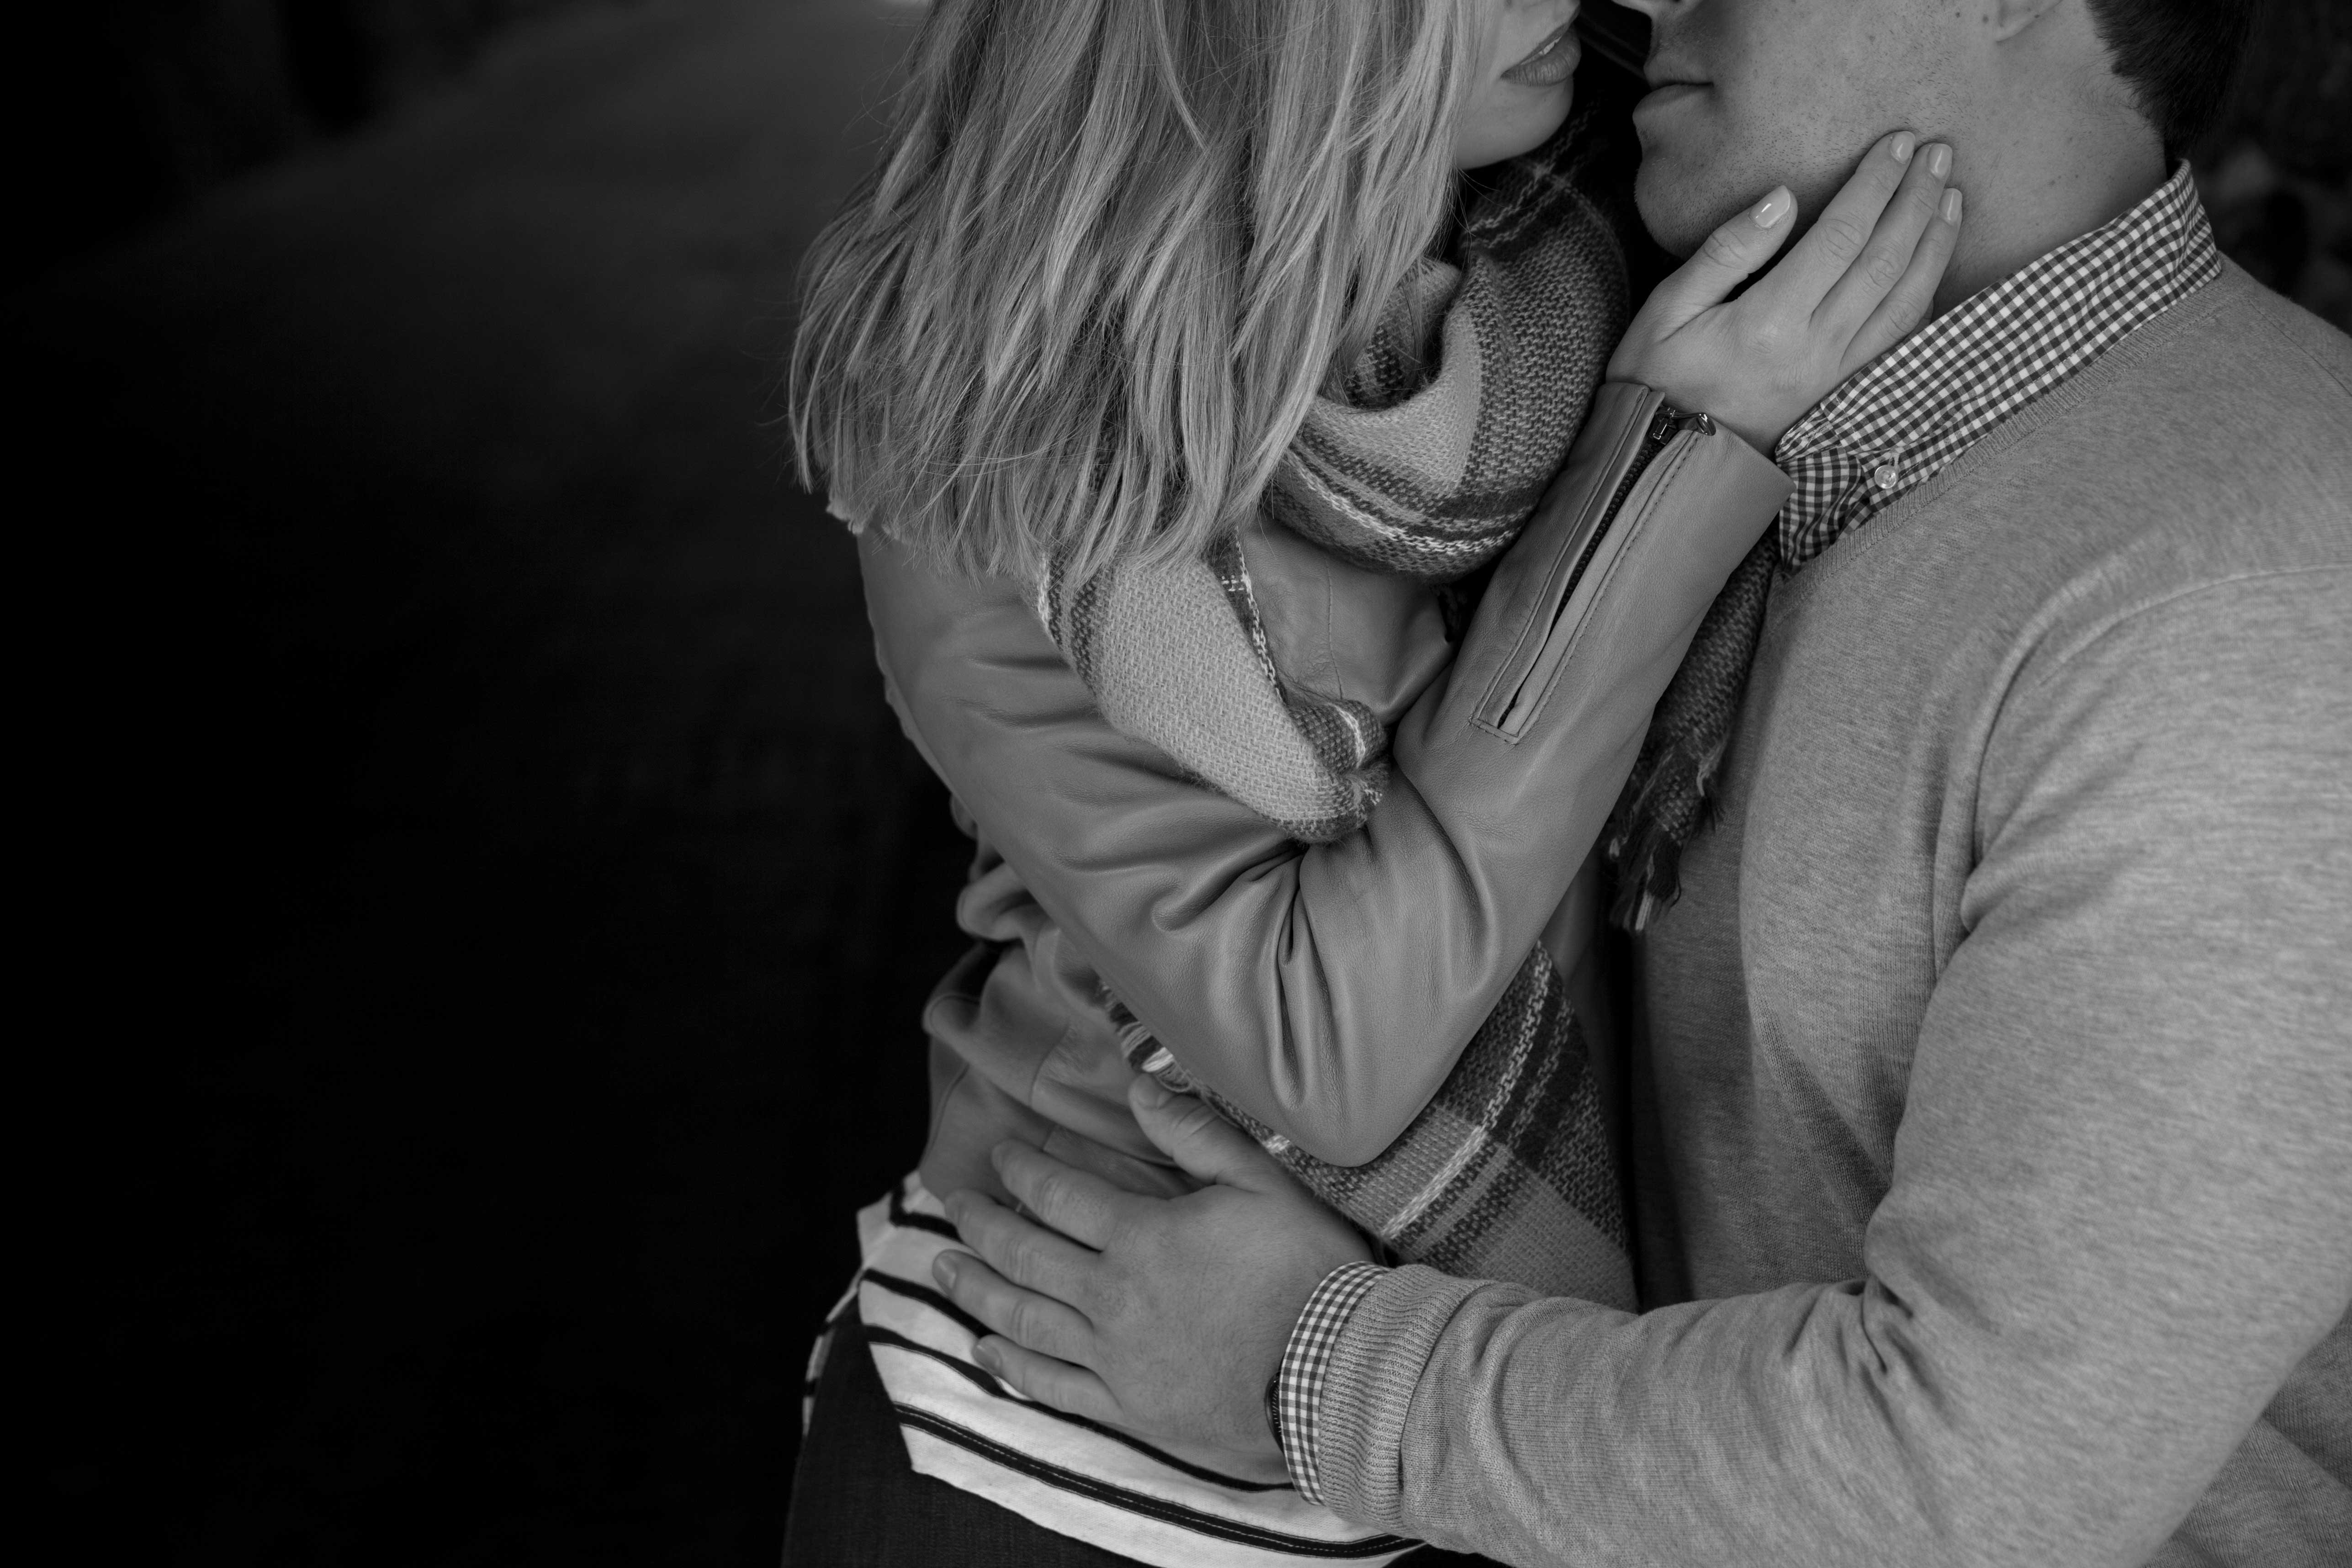 Close up black and white engagement shoot photo